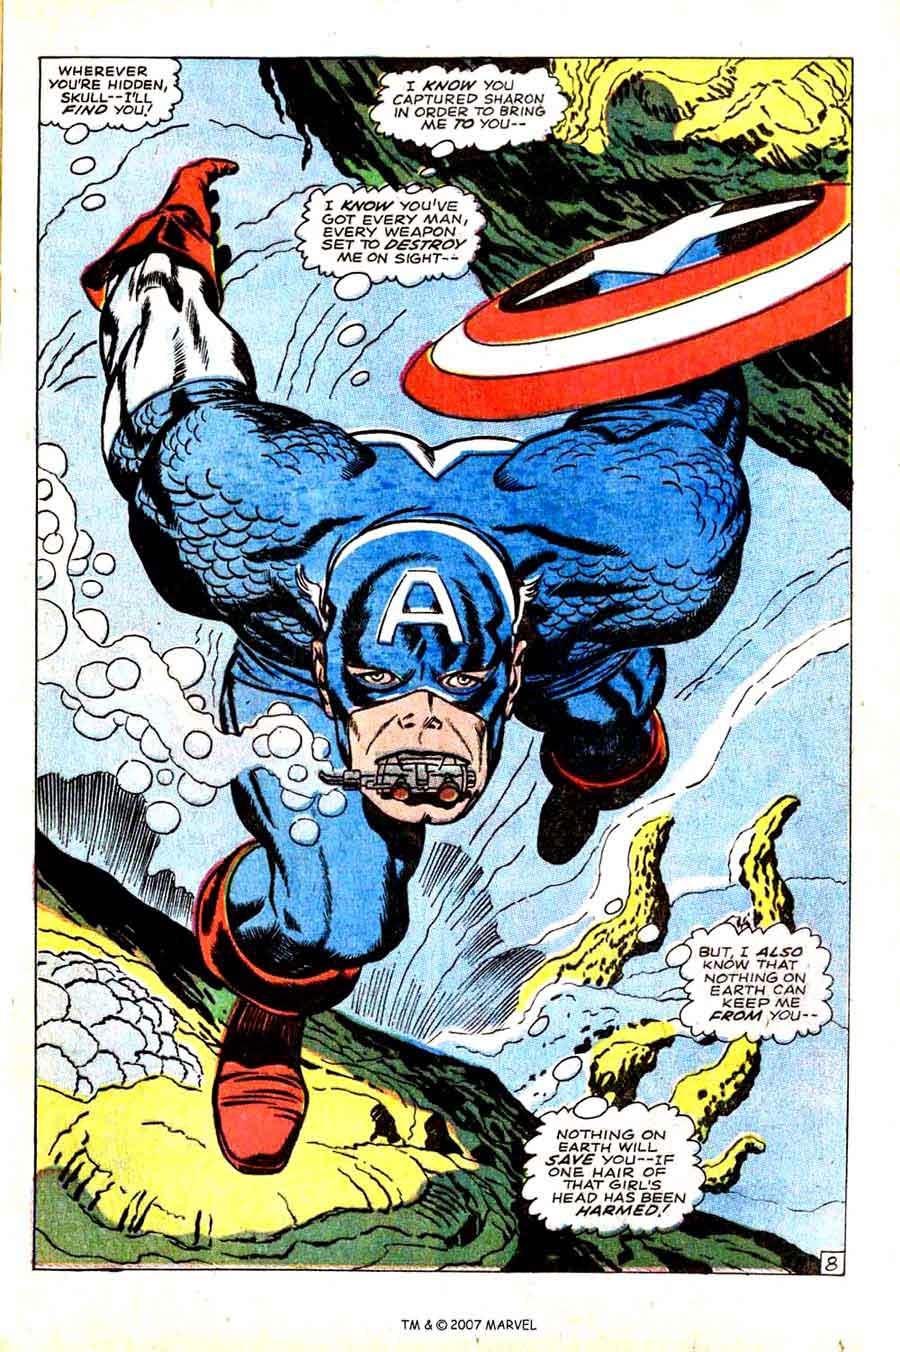 Captain America v1 #103 marvel comic book splash page art by Jack Kirby